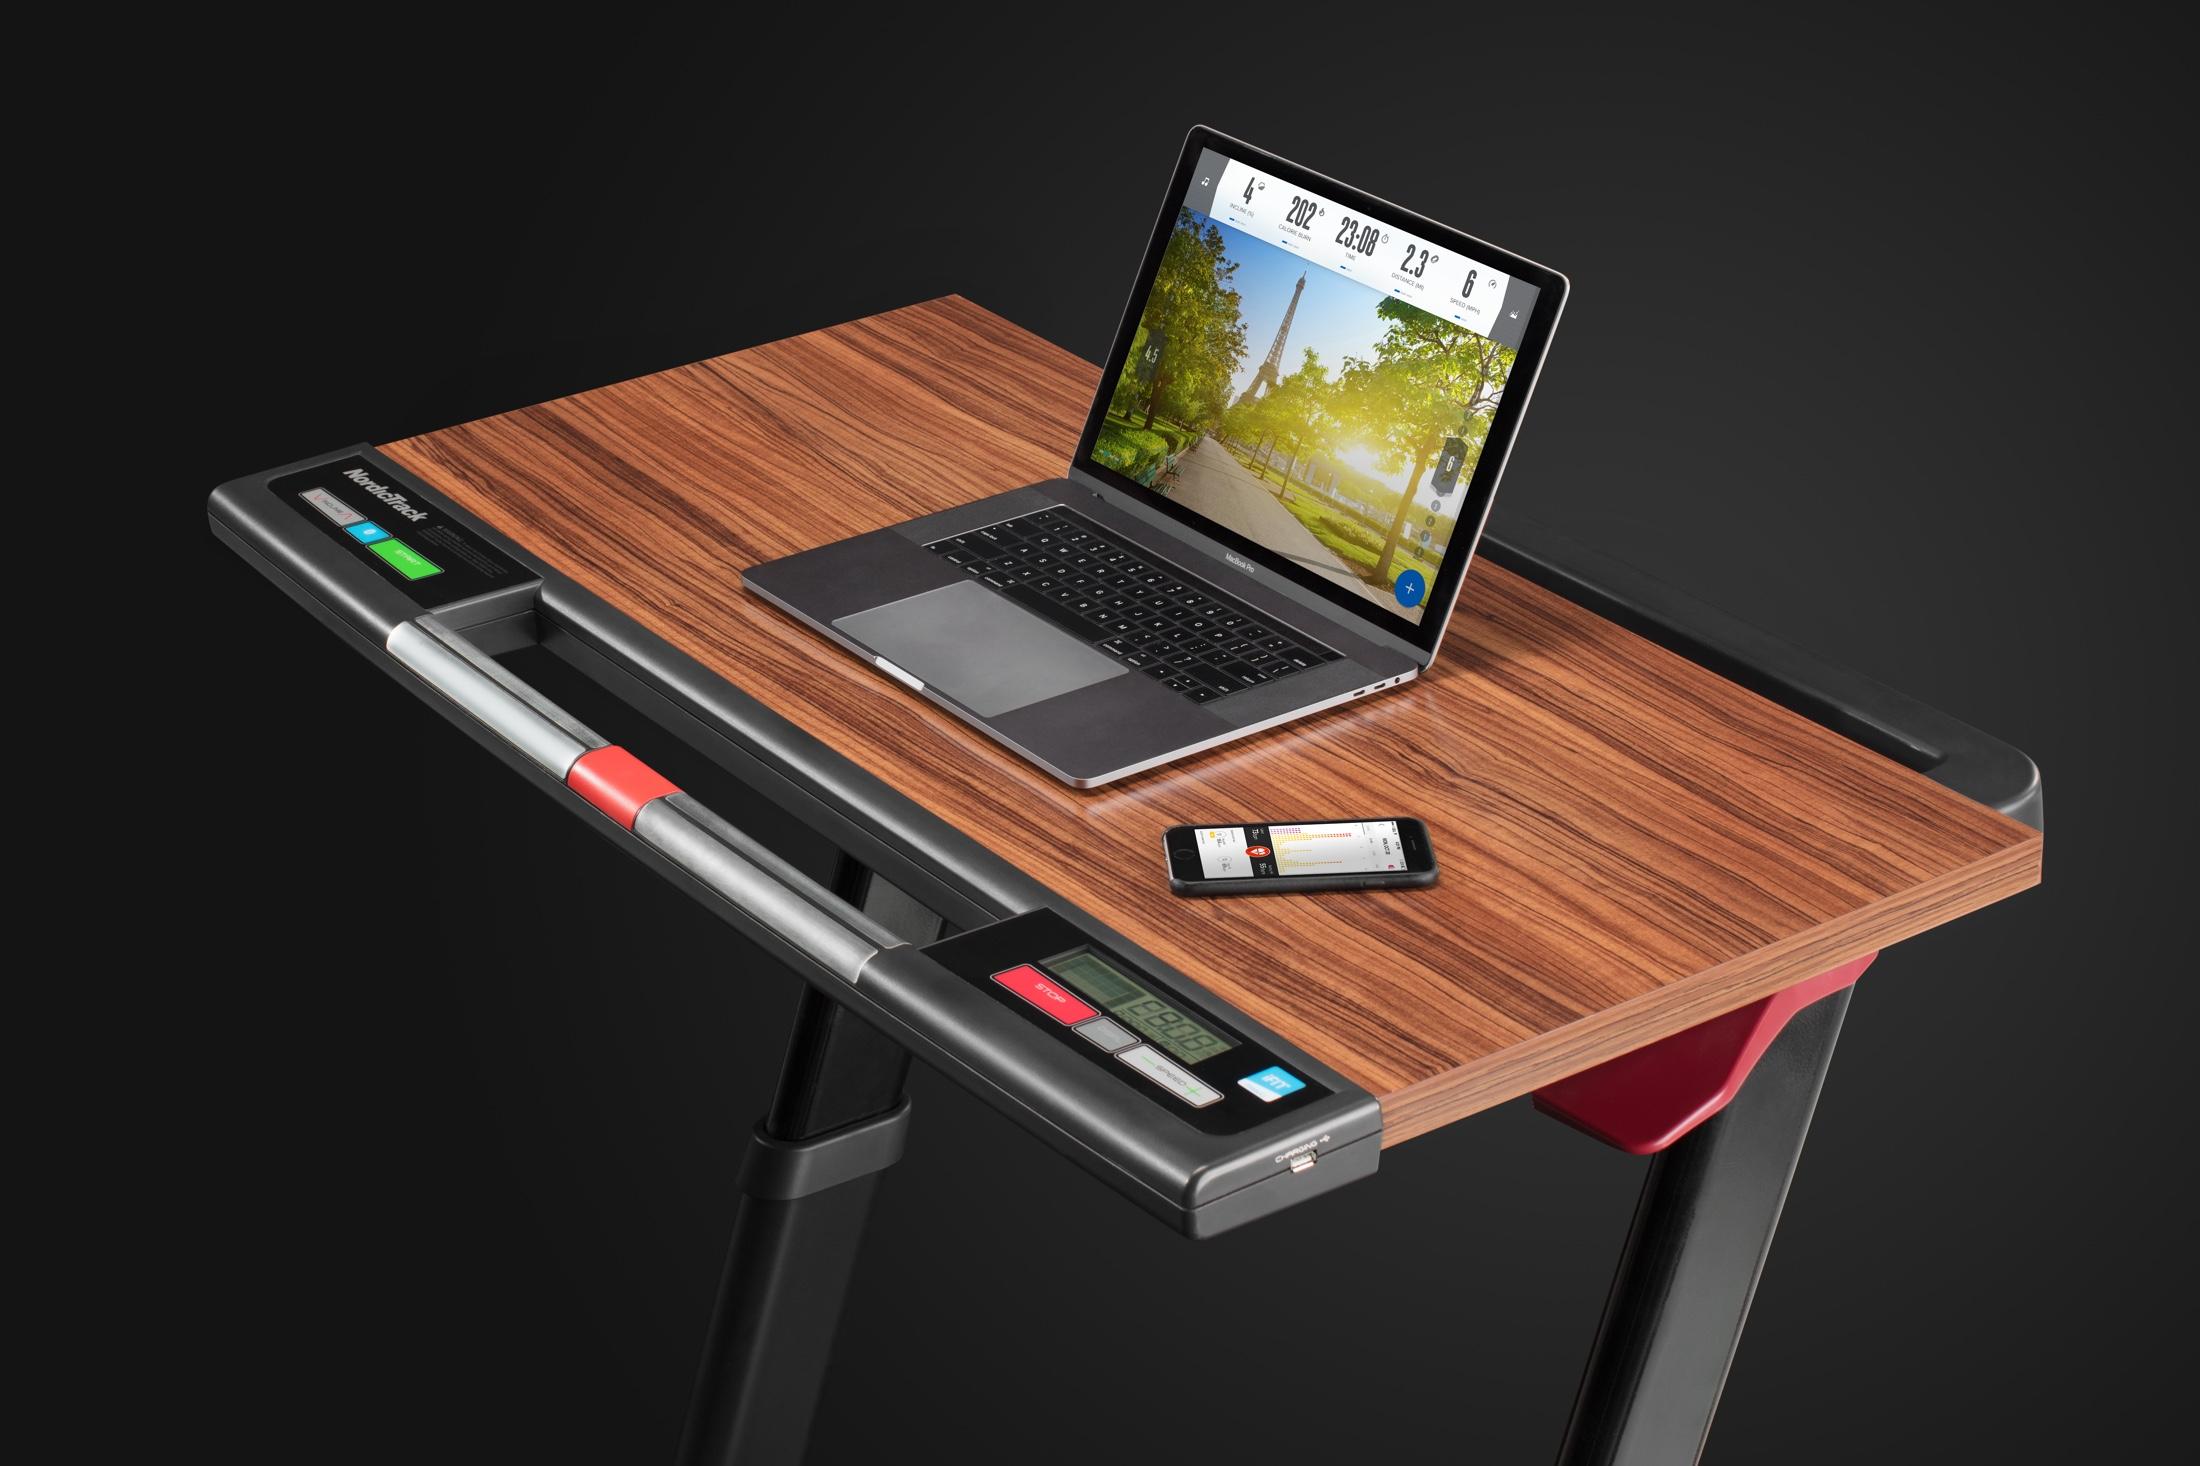 NordicTrack Treadmill Desk Platinum gallery image 6